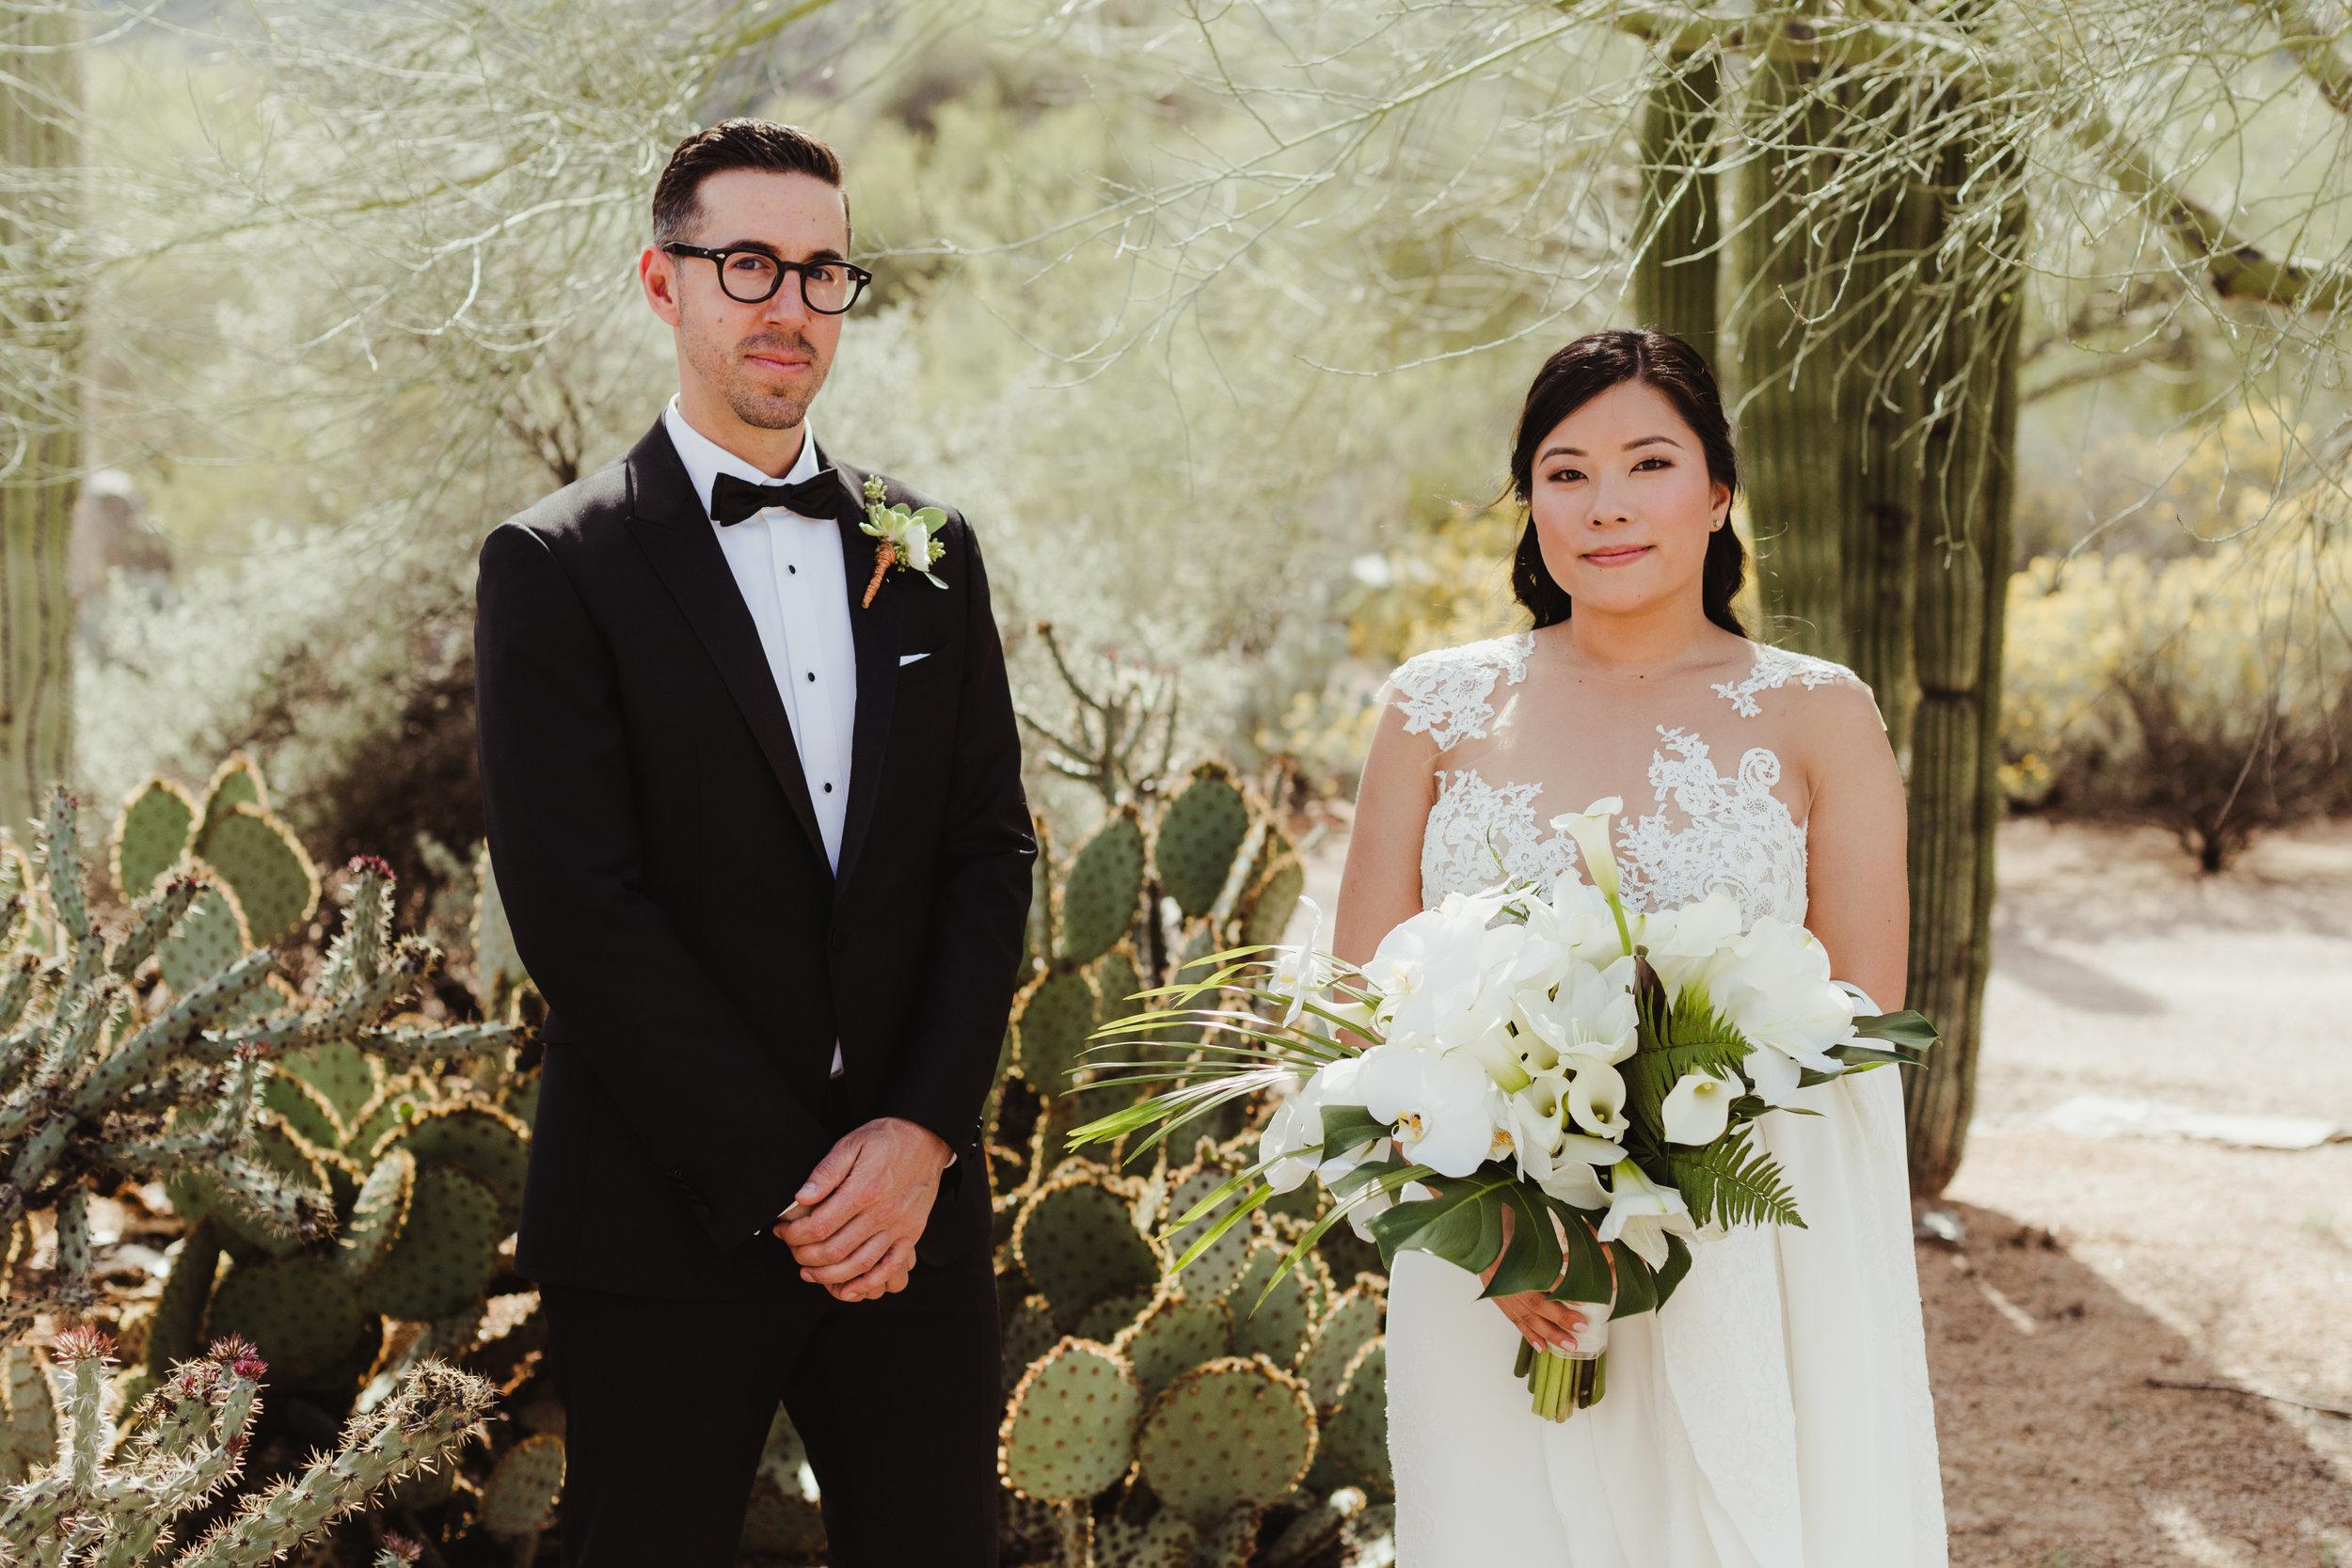 Arizona Wedding Photography by Hannah Costello.jpg